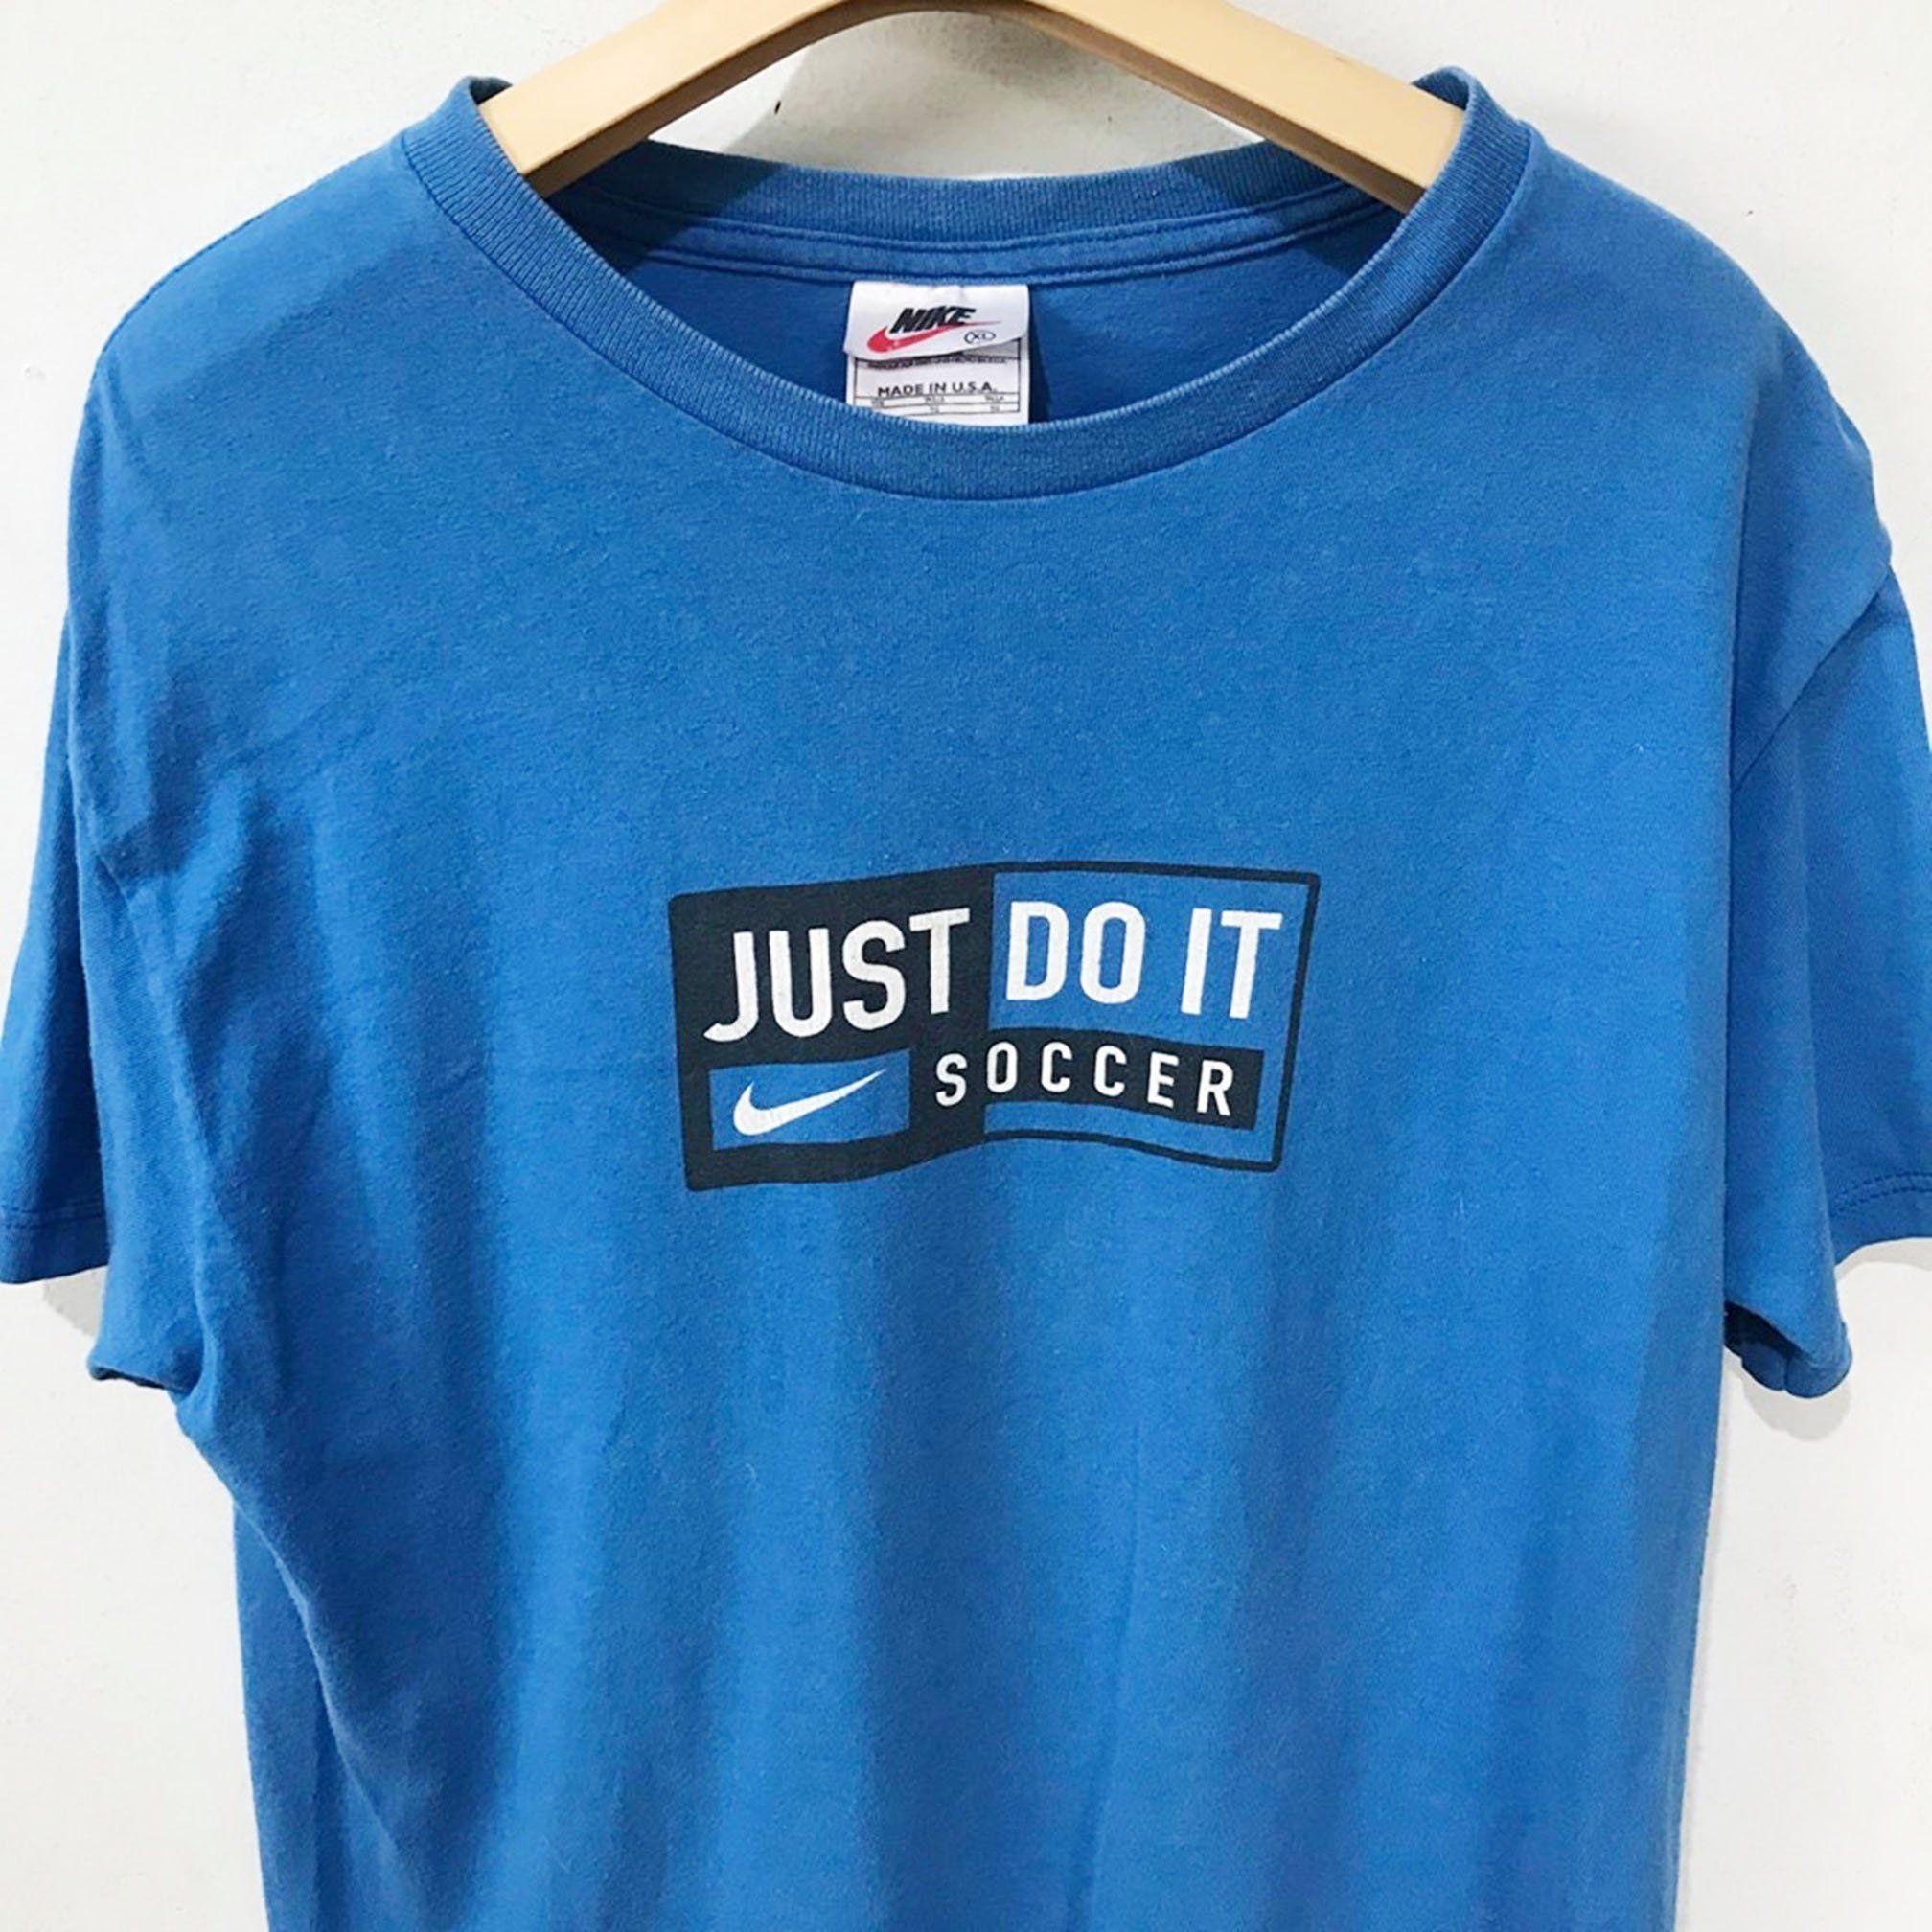 Vintage Nike T Shirt Size L Free Shipping Nike Just Do It Nike Soccer Logo Shirt Vintage Vintageclothing 90s Tshirt Logo Shirts Vintage Shirts Nike Tshirt